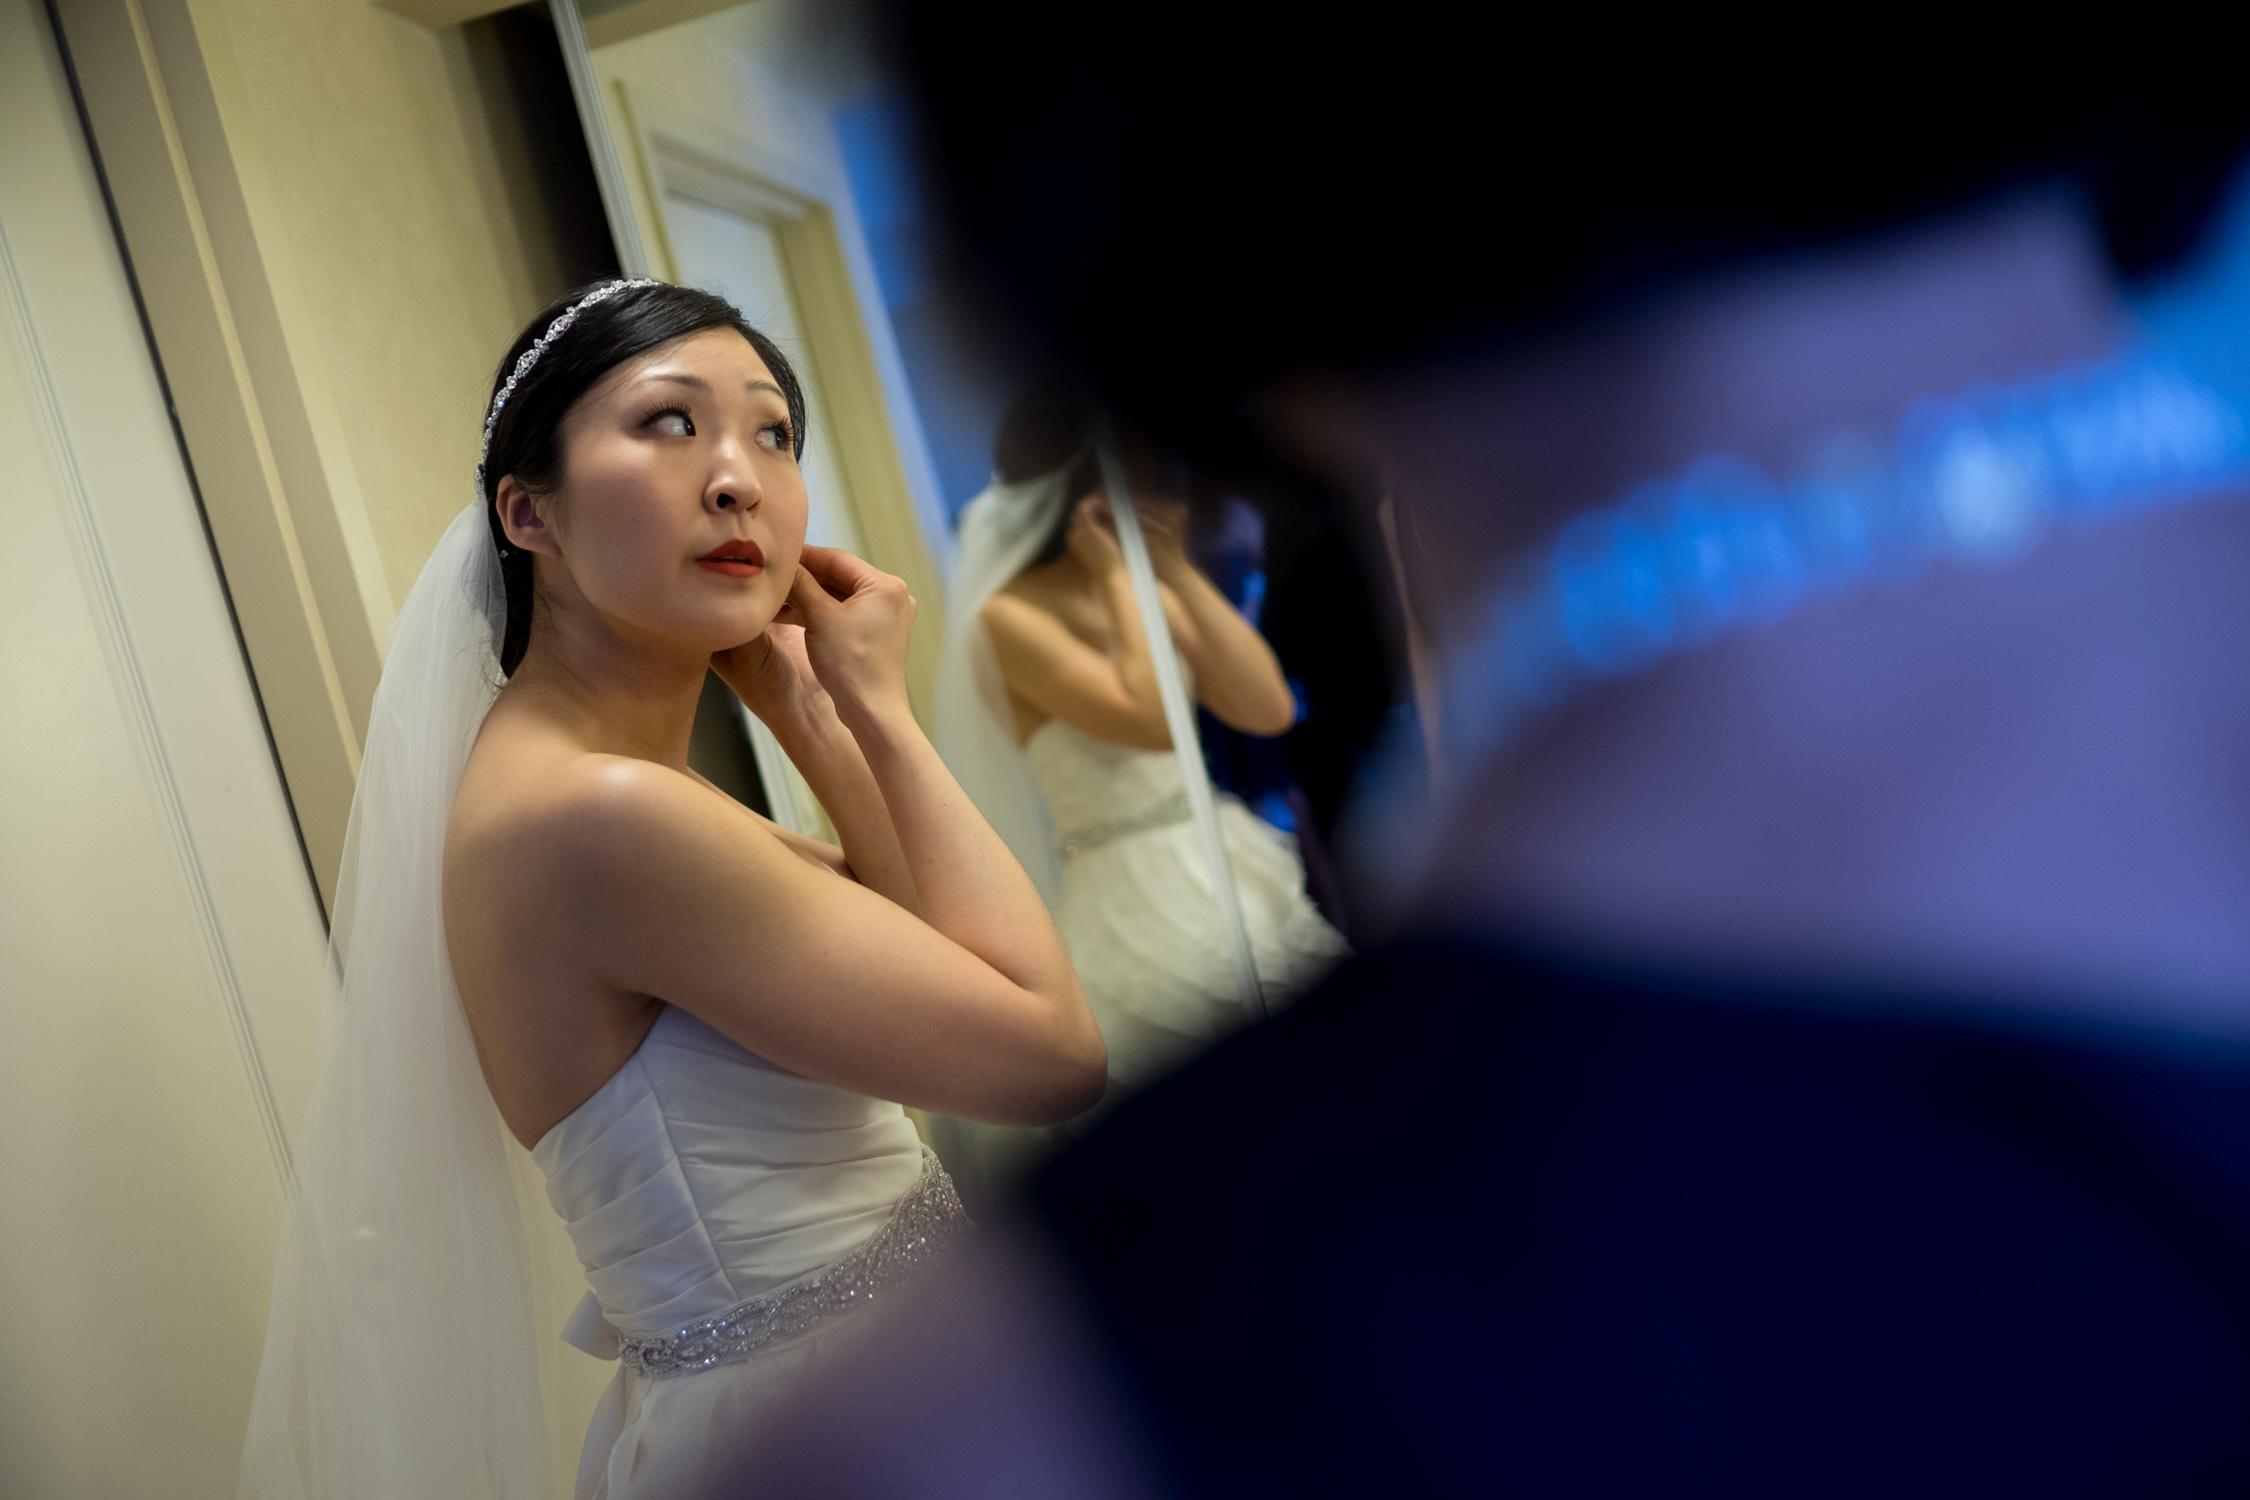 toronto_liberty_grand_wedding-007.jpg